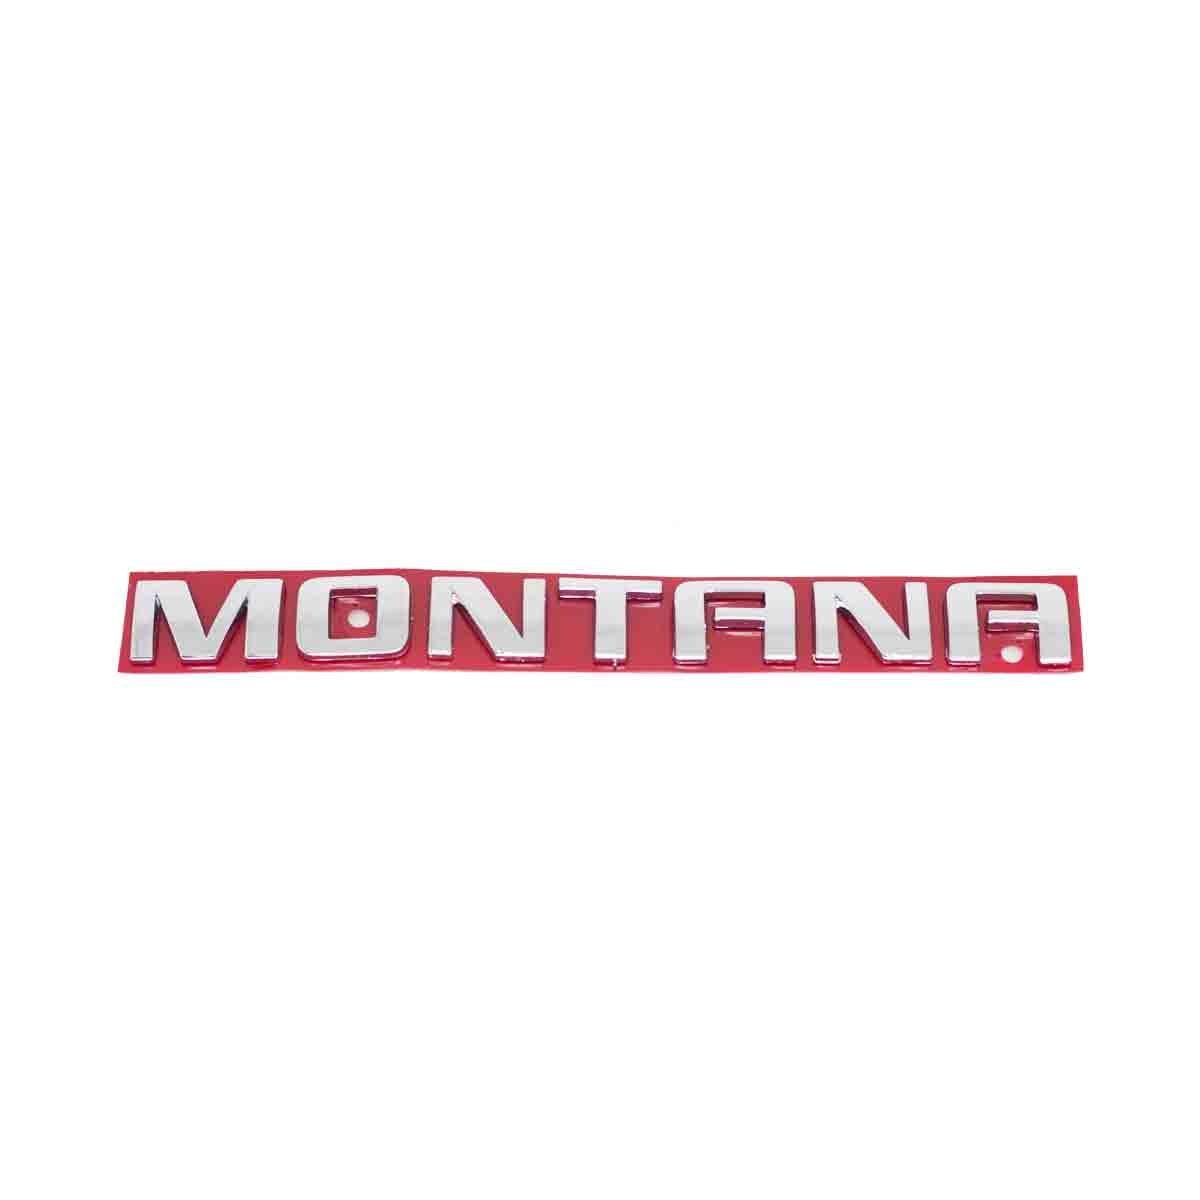 Emblema Montana 07/ Cromado